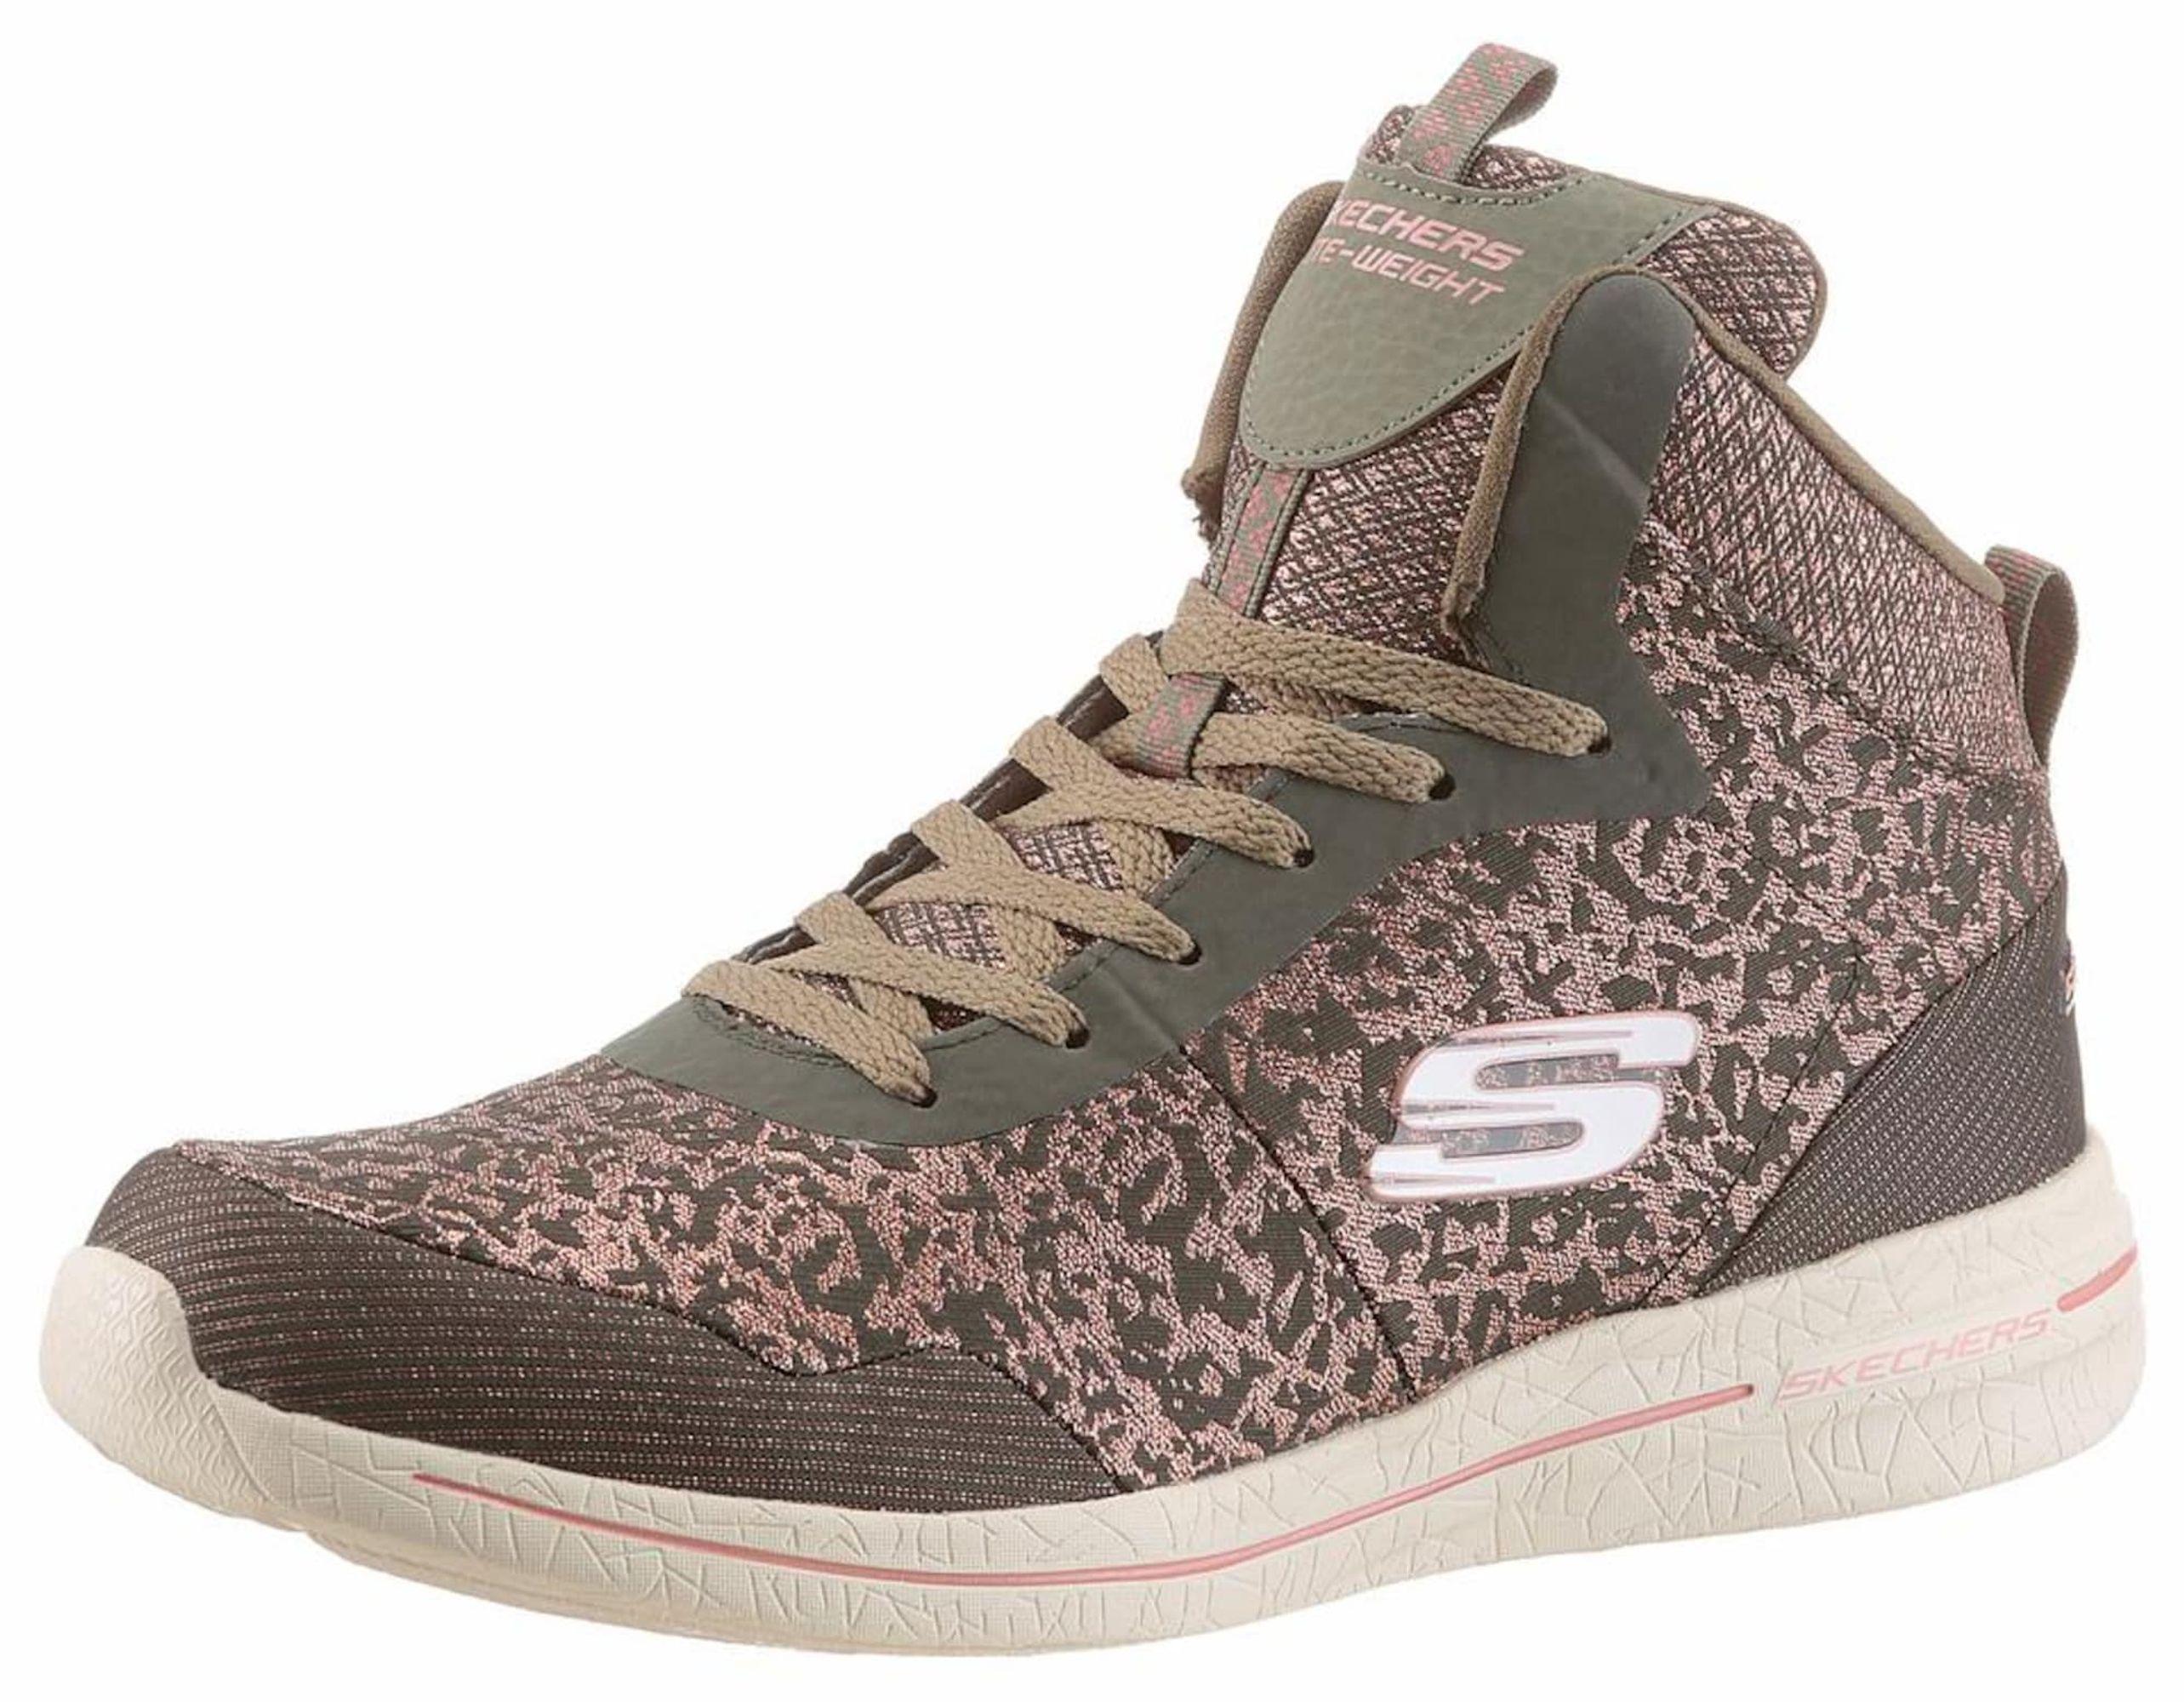 Sneaker ´Burst 2.0 Fashion Forwad´